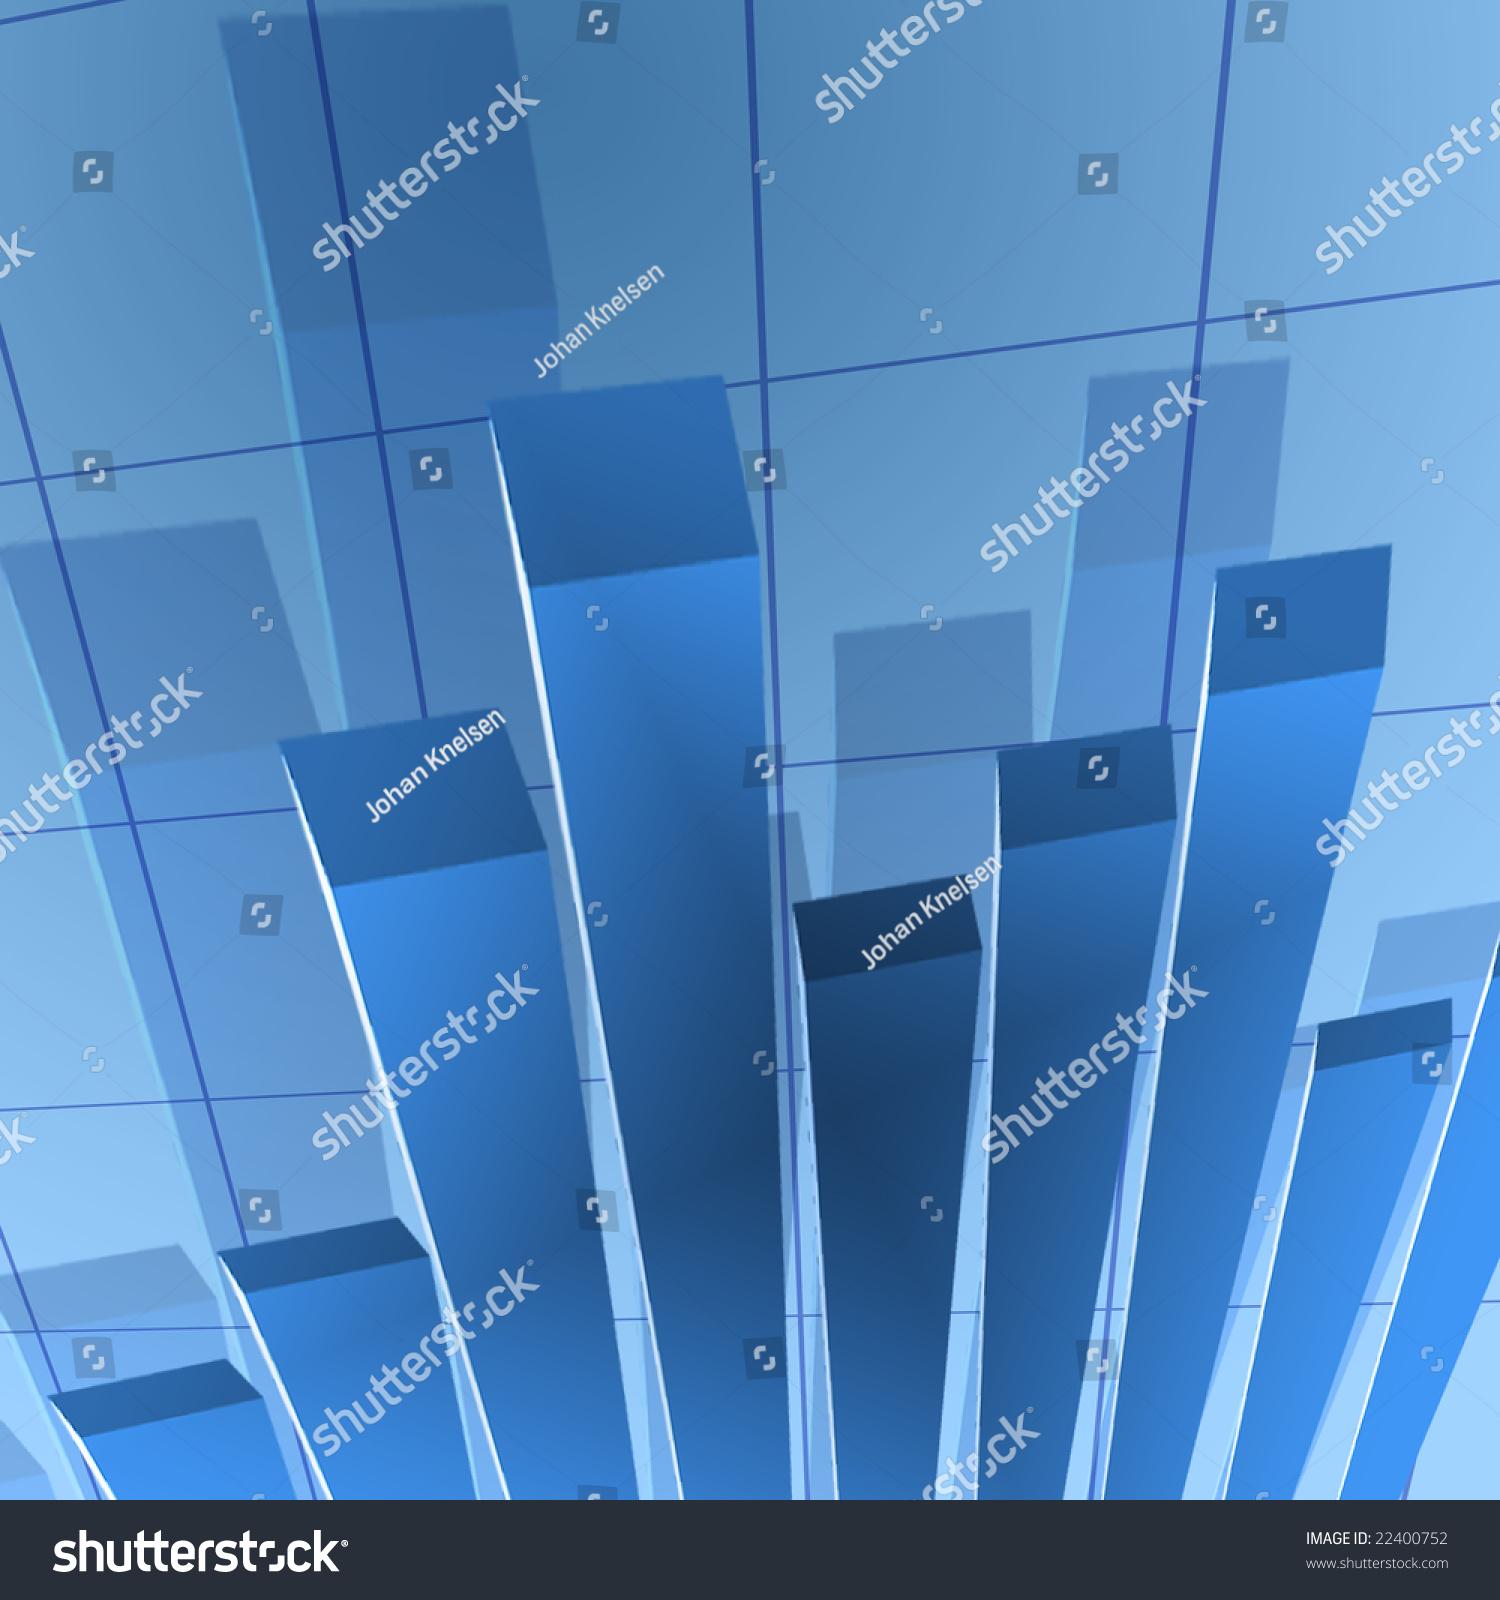 Finance Background: Financial Stat Background Stock Photo 22400752 : Shutterstock